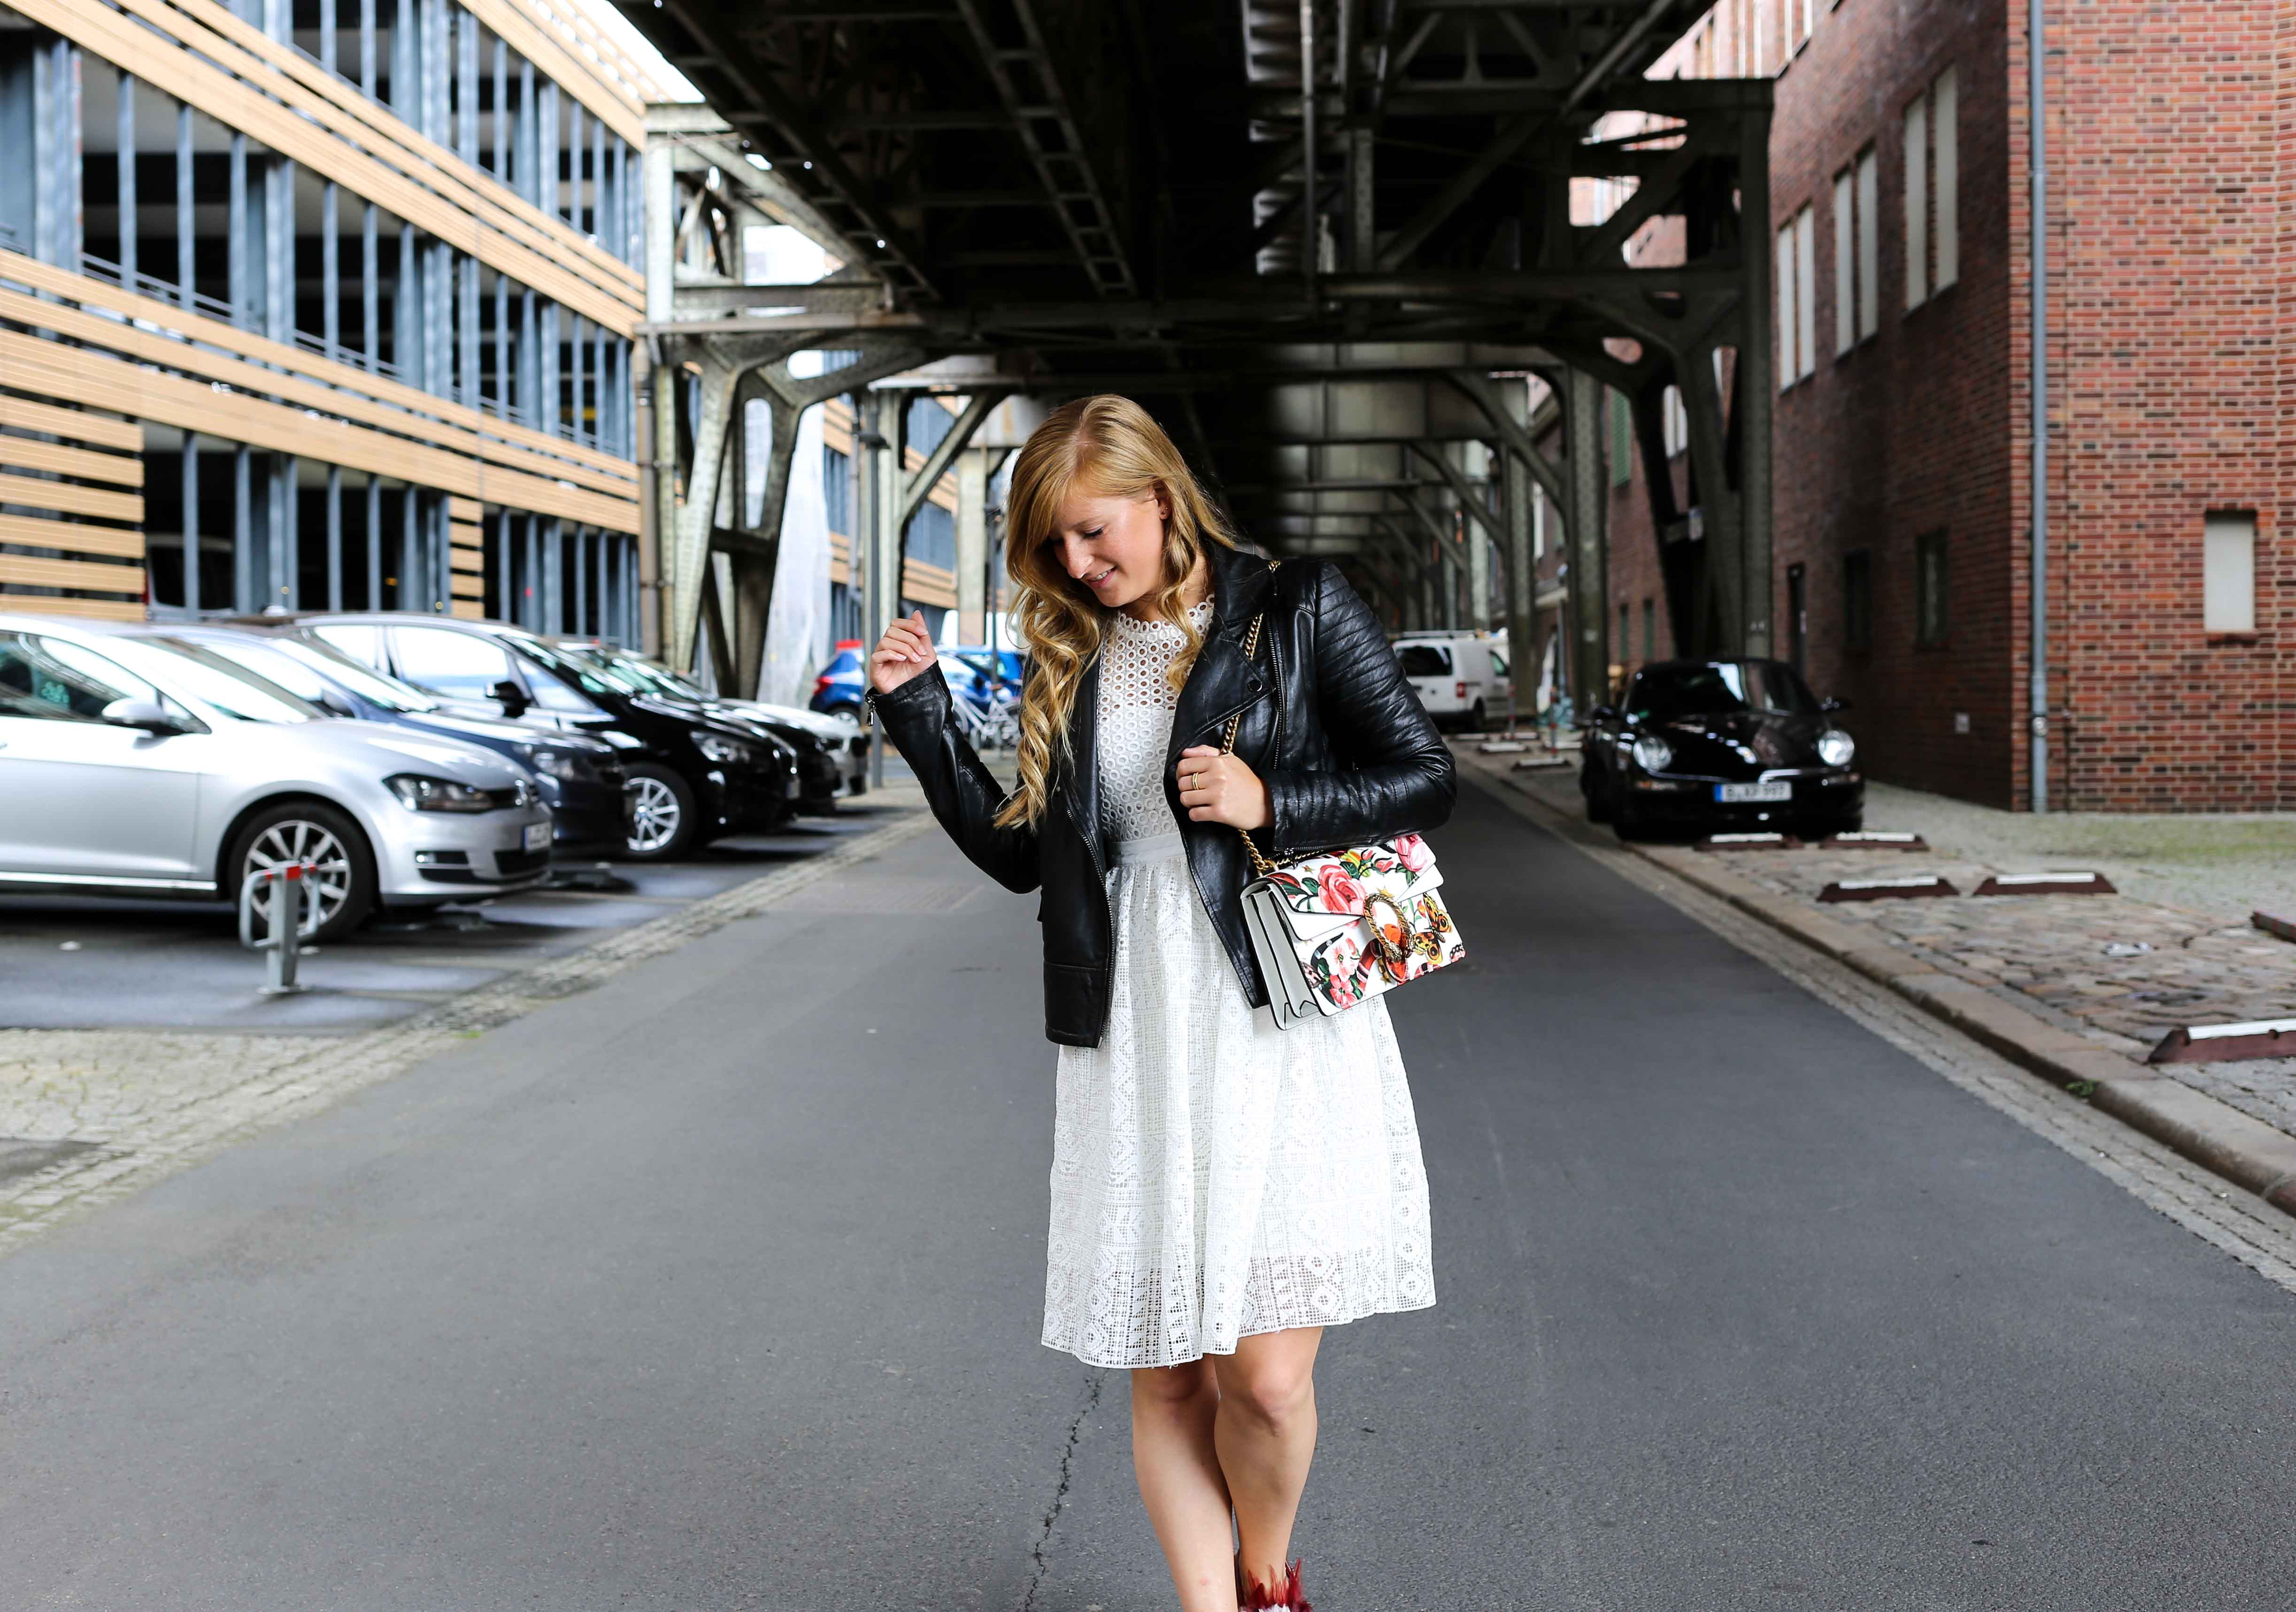 Fashion Week Outfit weißes Spitzenkleid Asos flache Ledersandalen mit Federn kombinieren Lederjacke Modeblog Deutschland Fashion Blogger OOTD 6